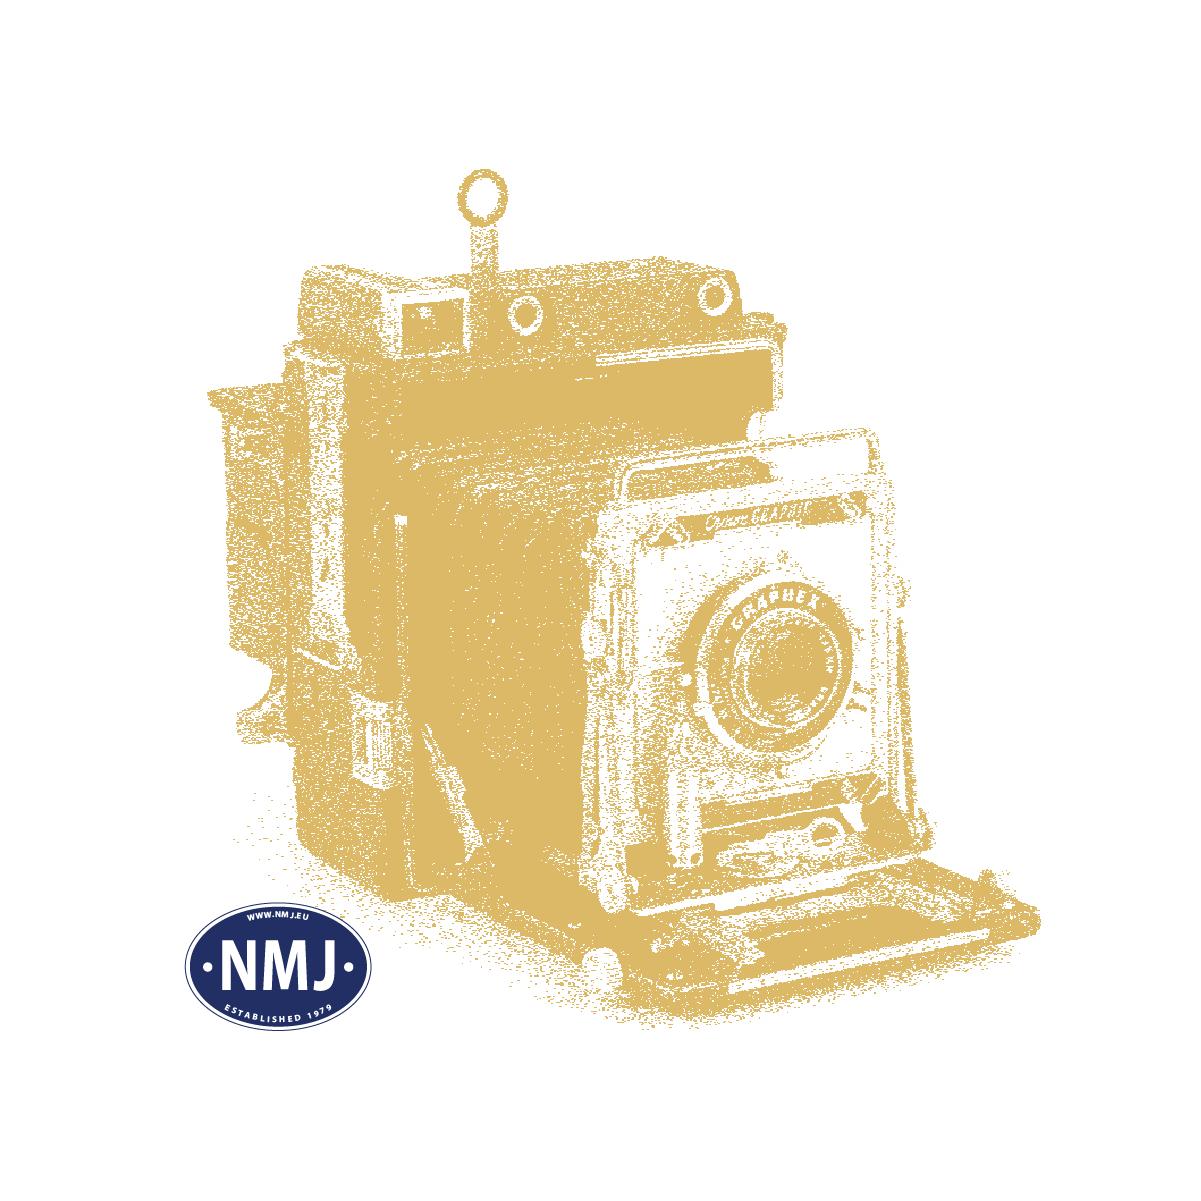 "NMJT605.303 - NMJ Topline Grf 48017 ""Tre Ess/Milda"" refrigerator car"